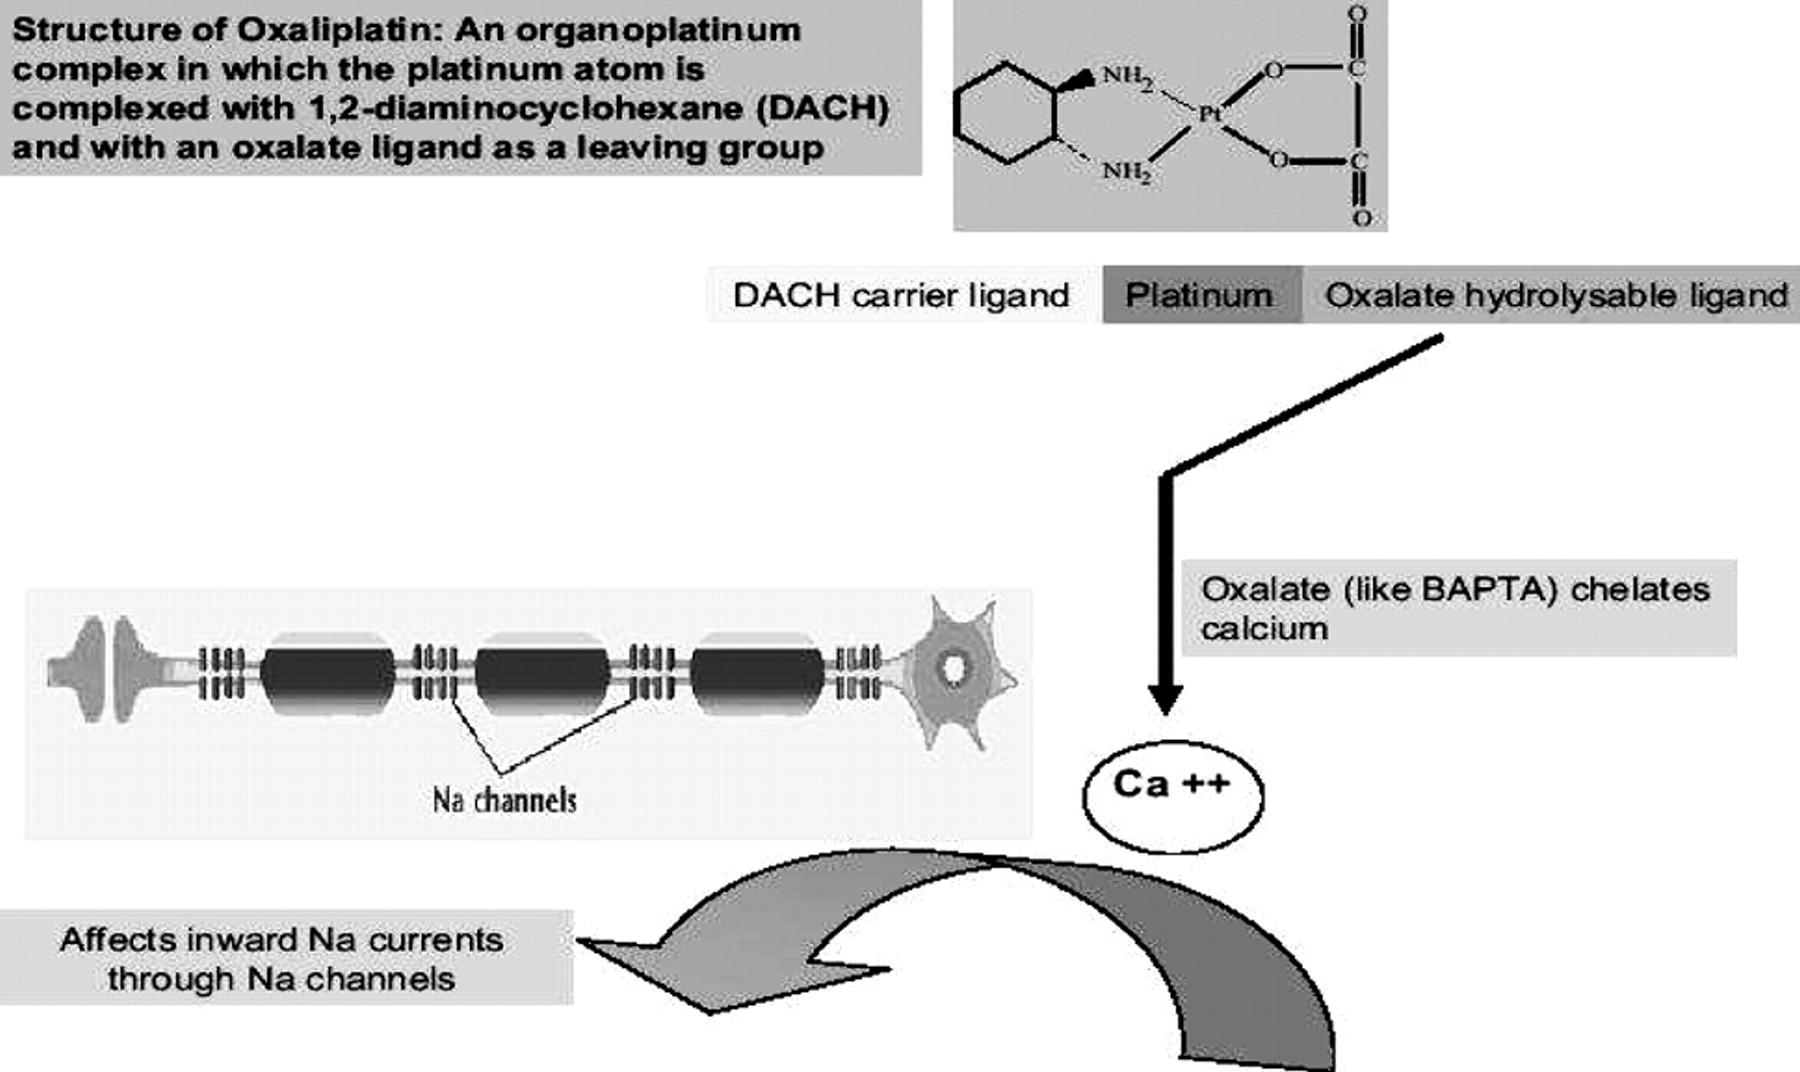 oxaliplatin neuropathy pregabalin for anxiety